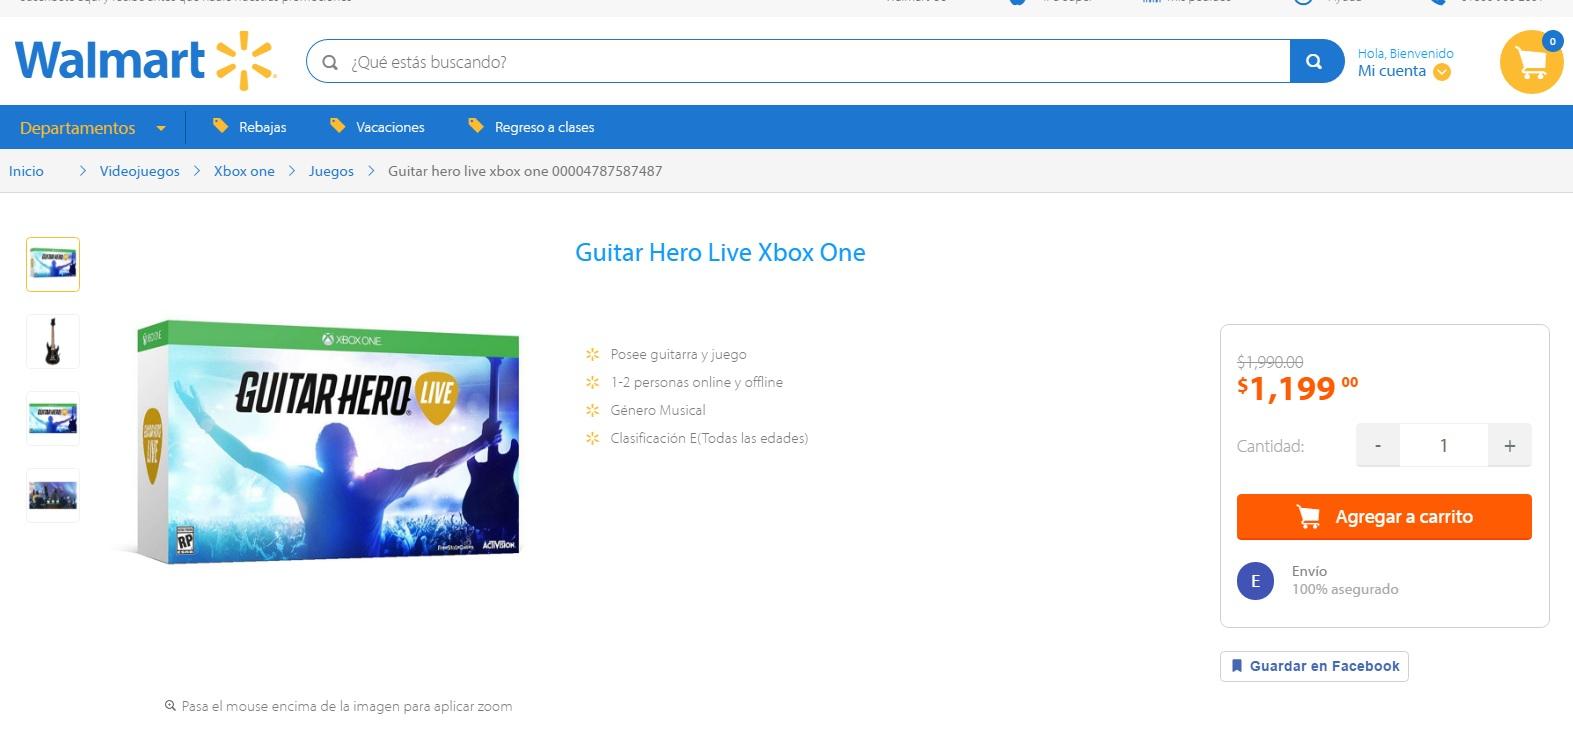 Walmart en línea: Guitar Hero Live para Xbox One a $1,199.